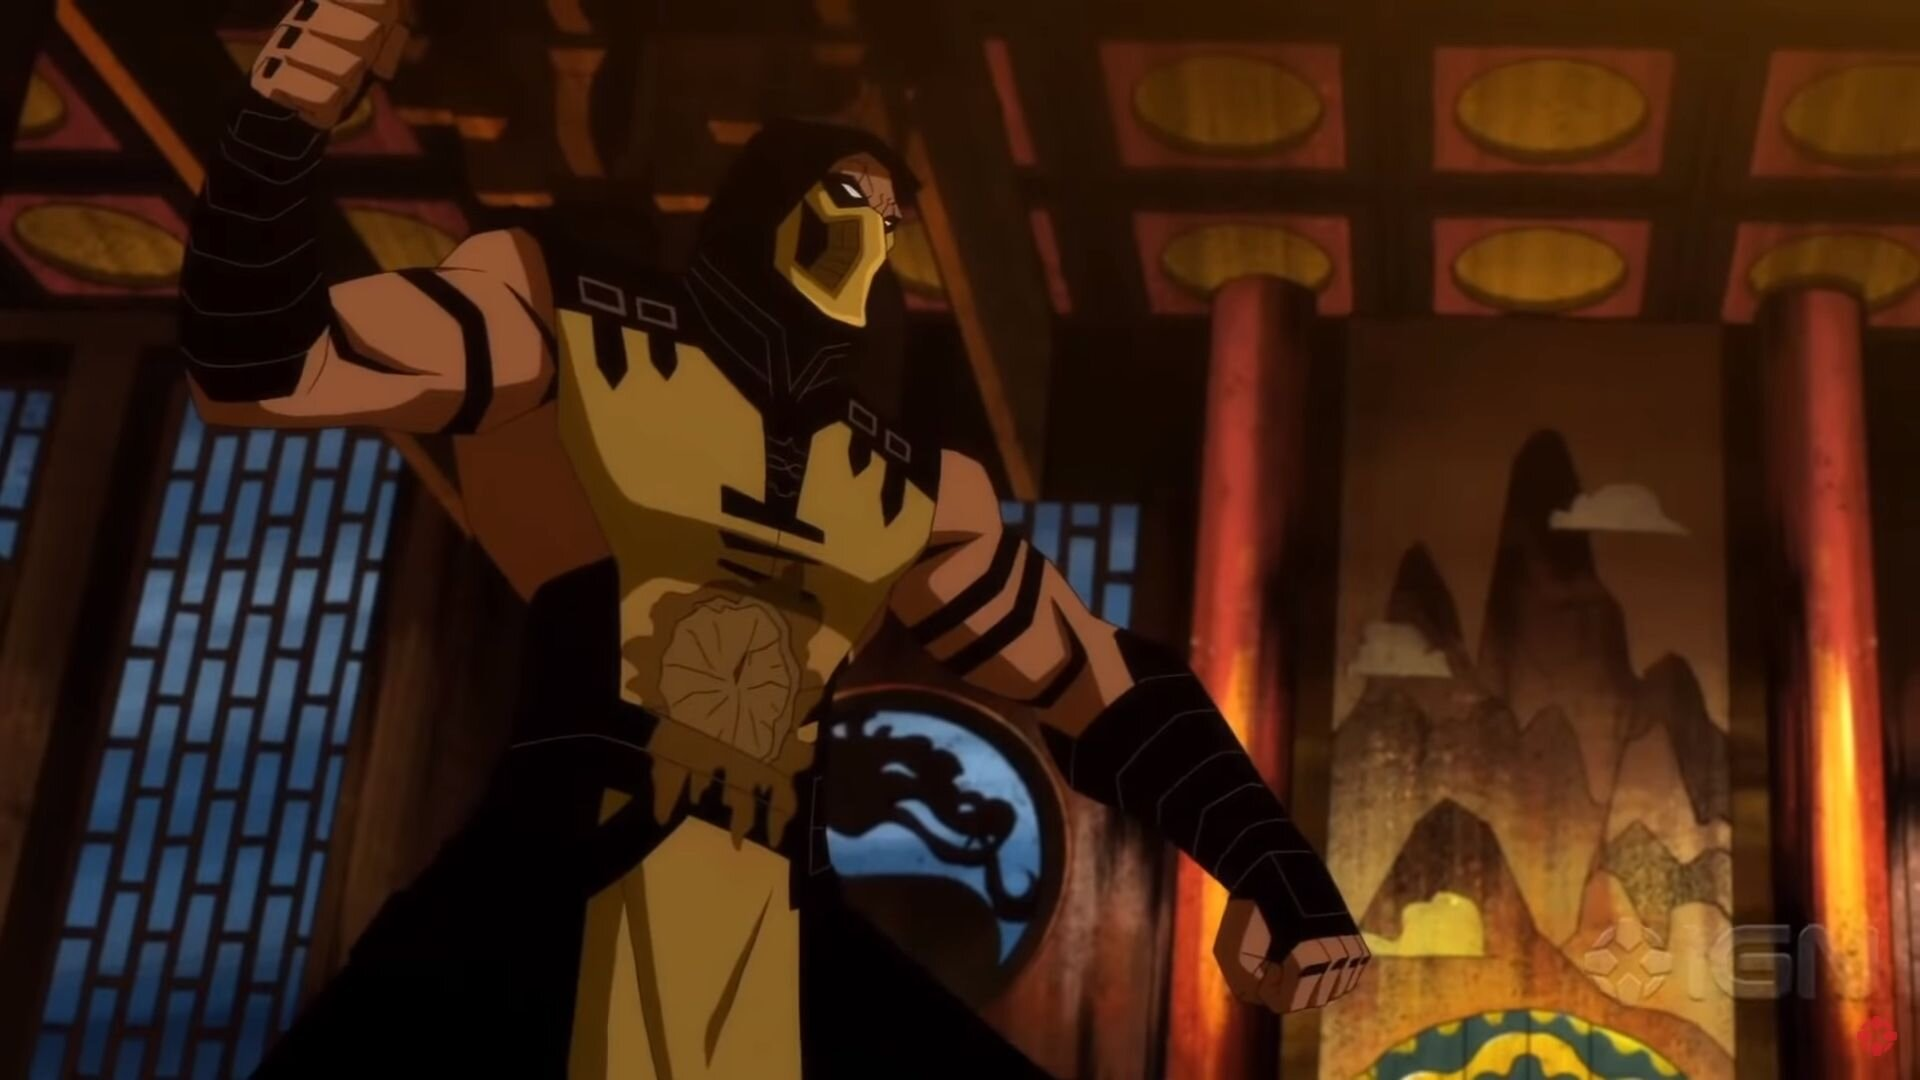 New Trailer For The Animated Film Mortal Kombat Legends